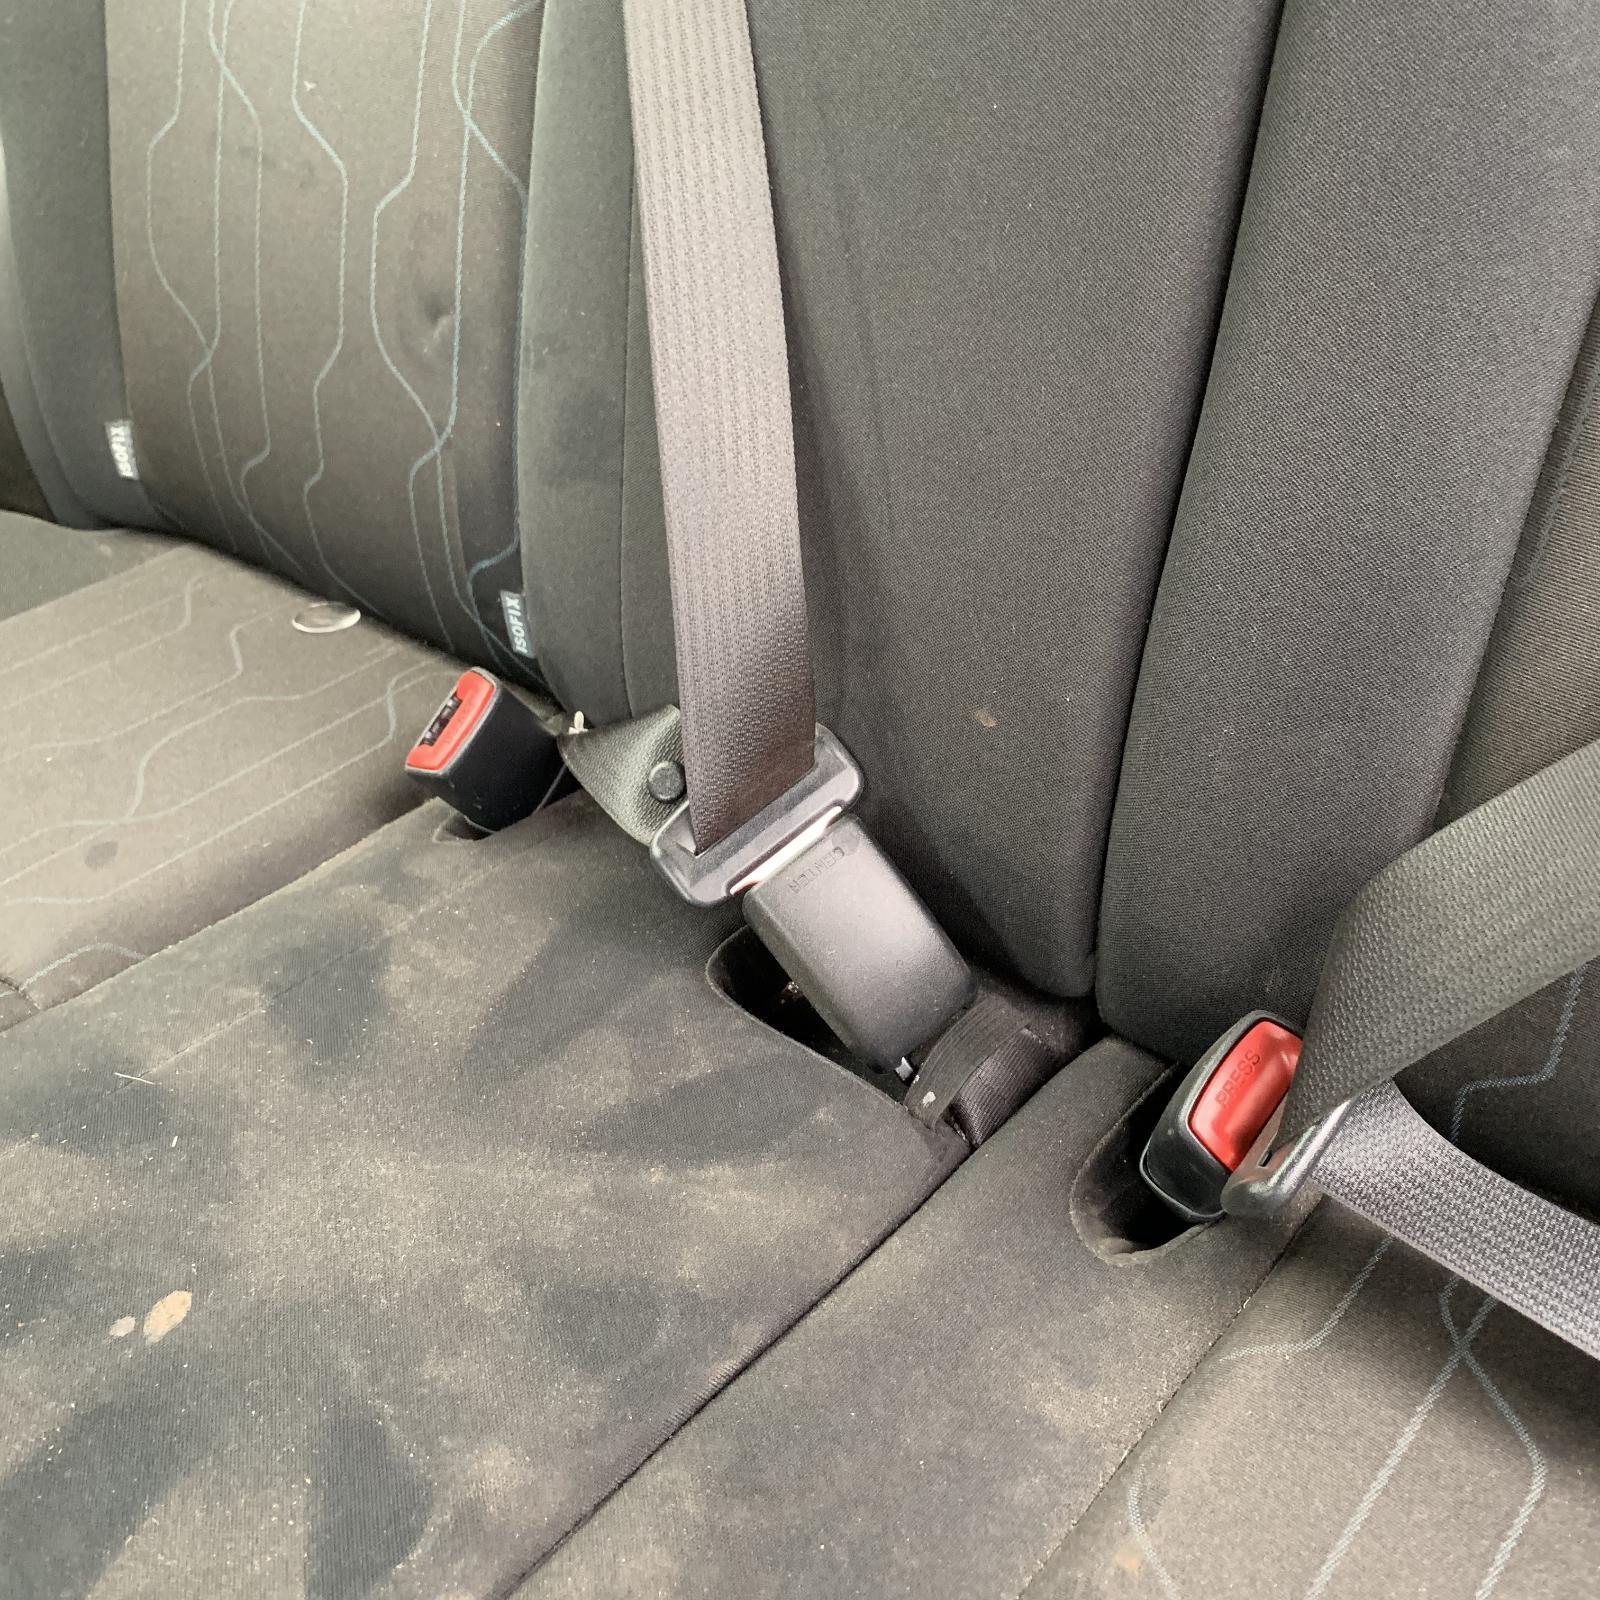 TOYOTA COROLLA, Seatbelt/Stalk, CENTRE REAR, SEAT BELT ONLY, ZRE152R, HATCH, 03/07-09/12